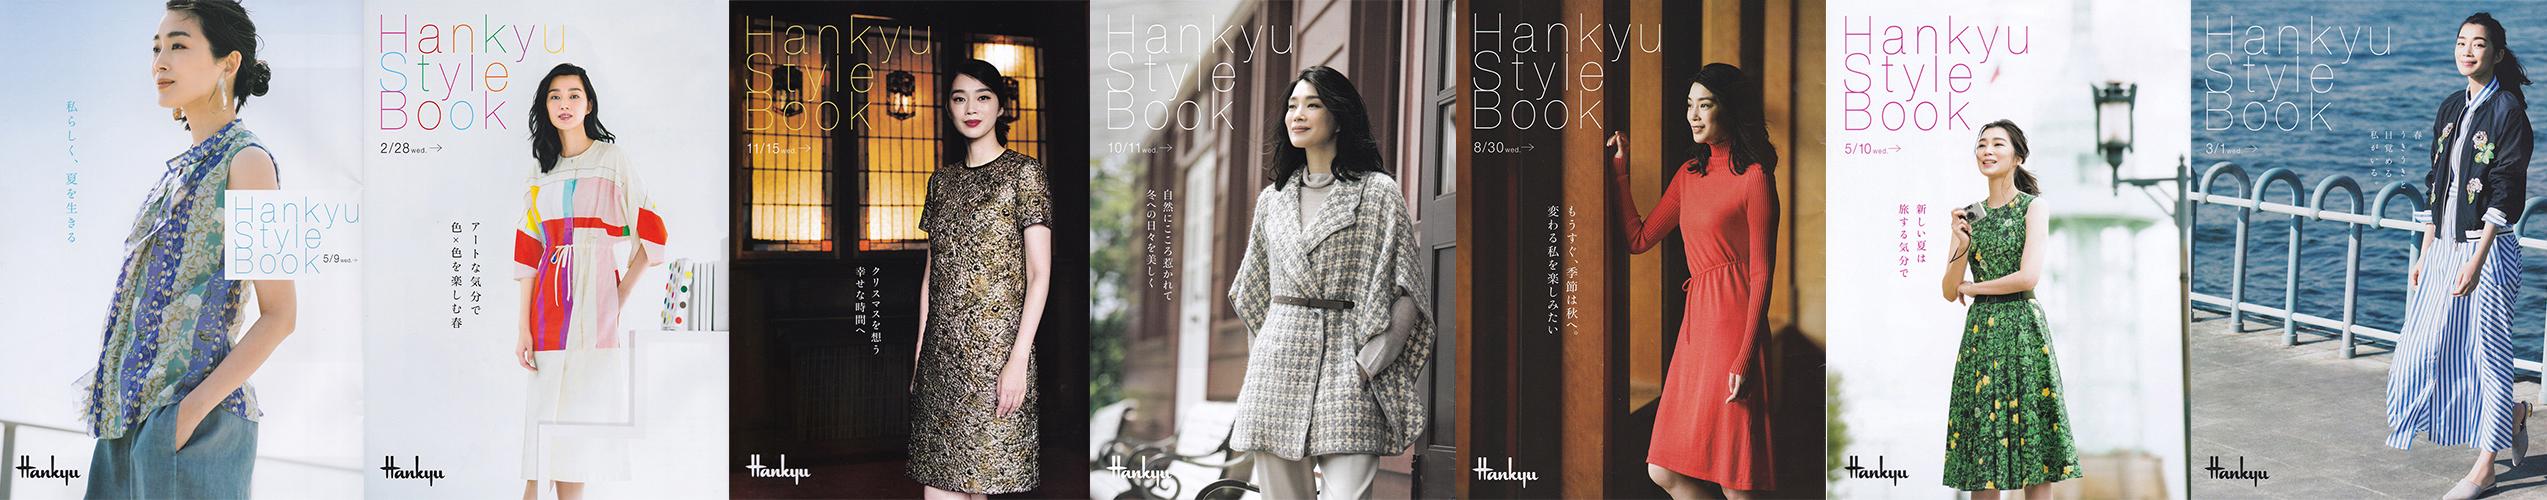 Hankyu Style Book